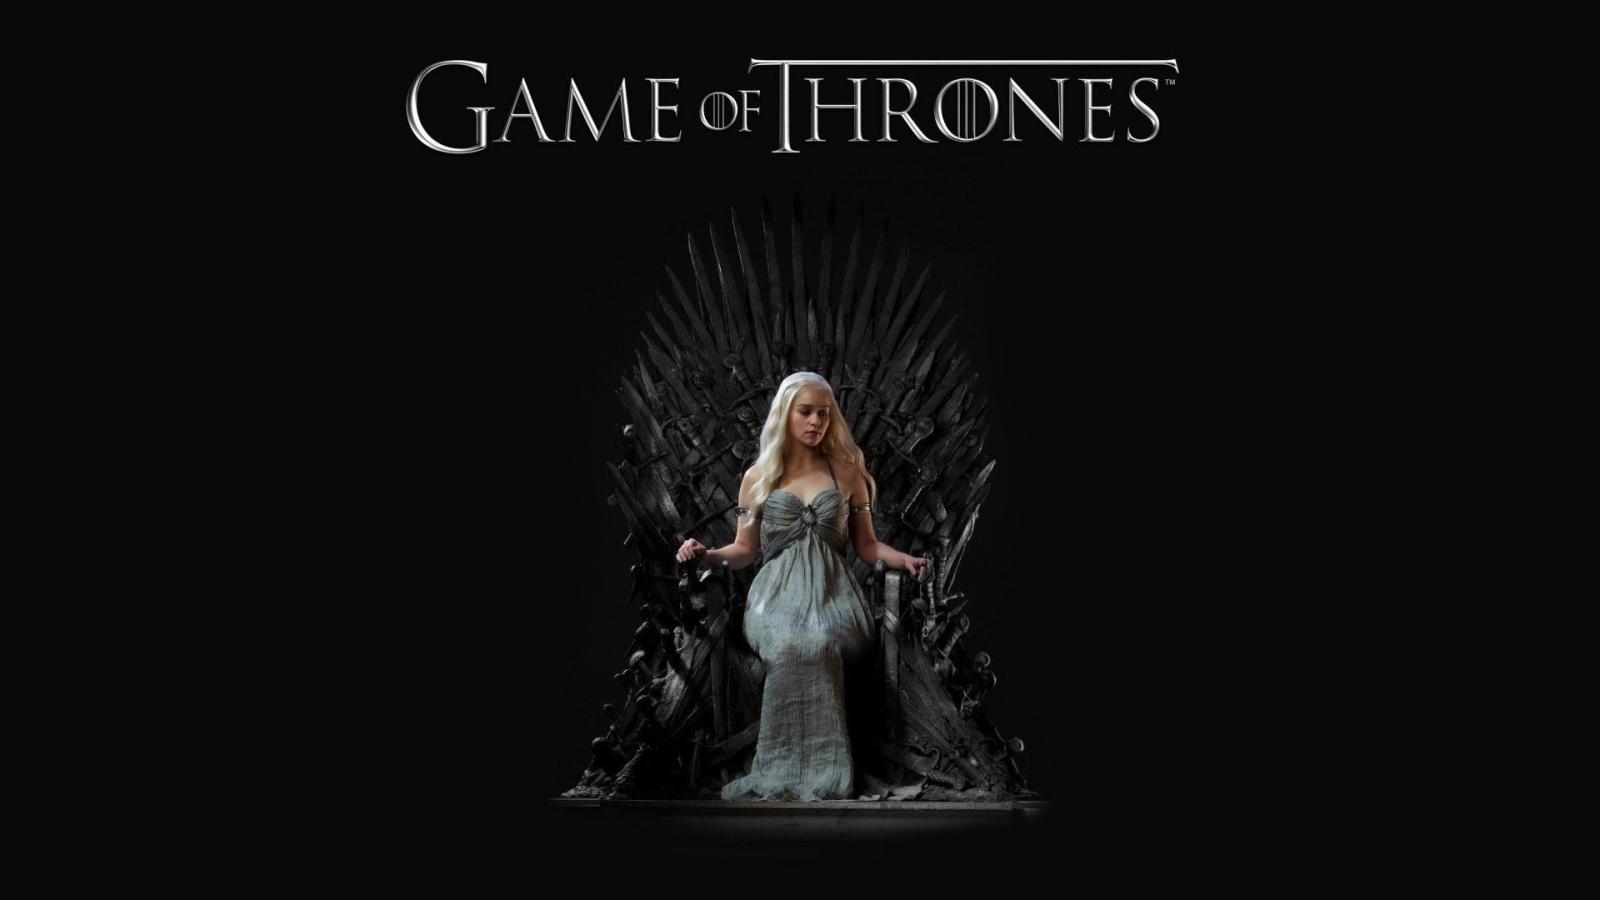 1600x900 Daenerys Targaryen Game Of Thrones Tv Show